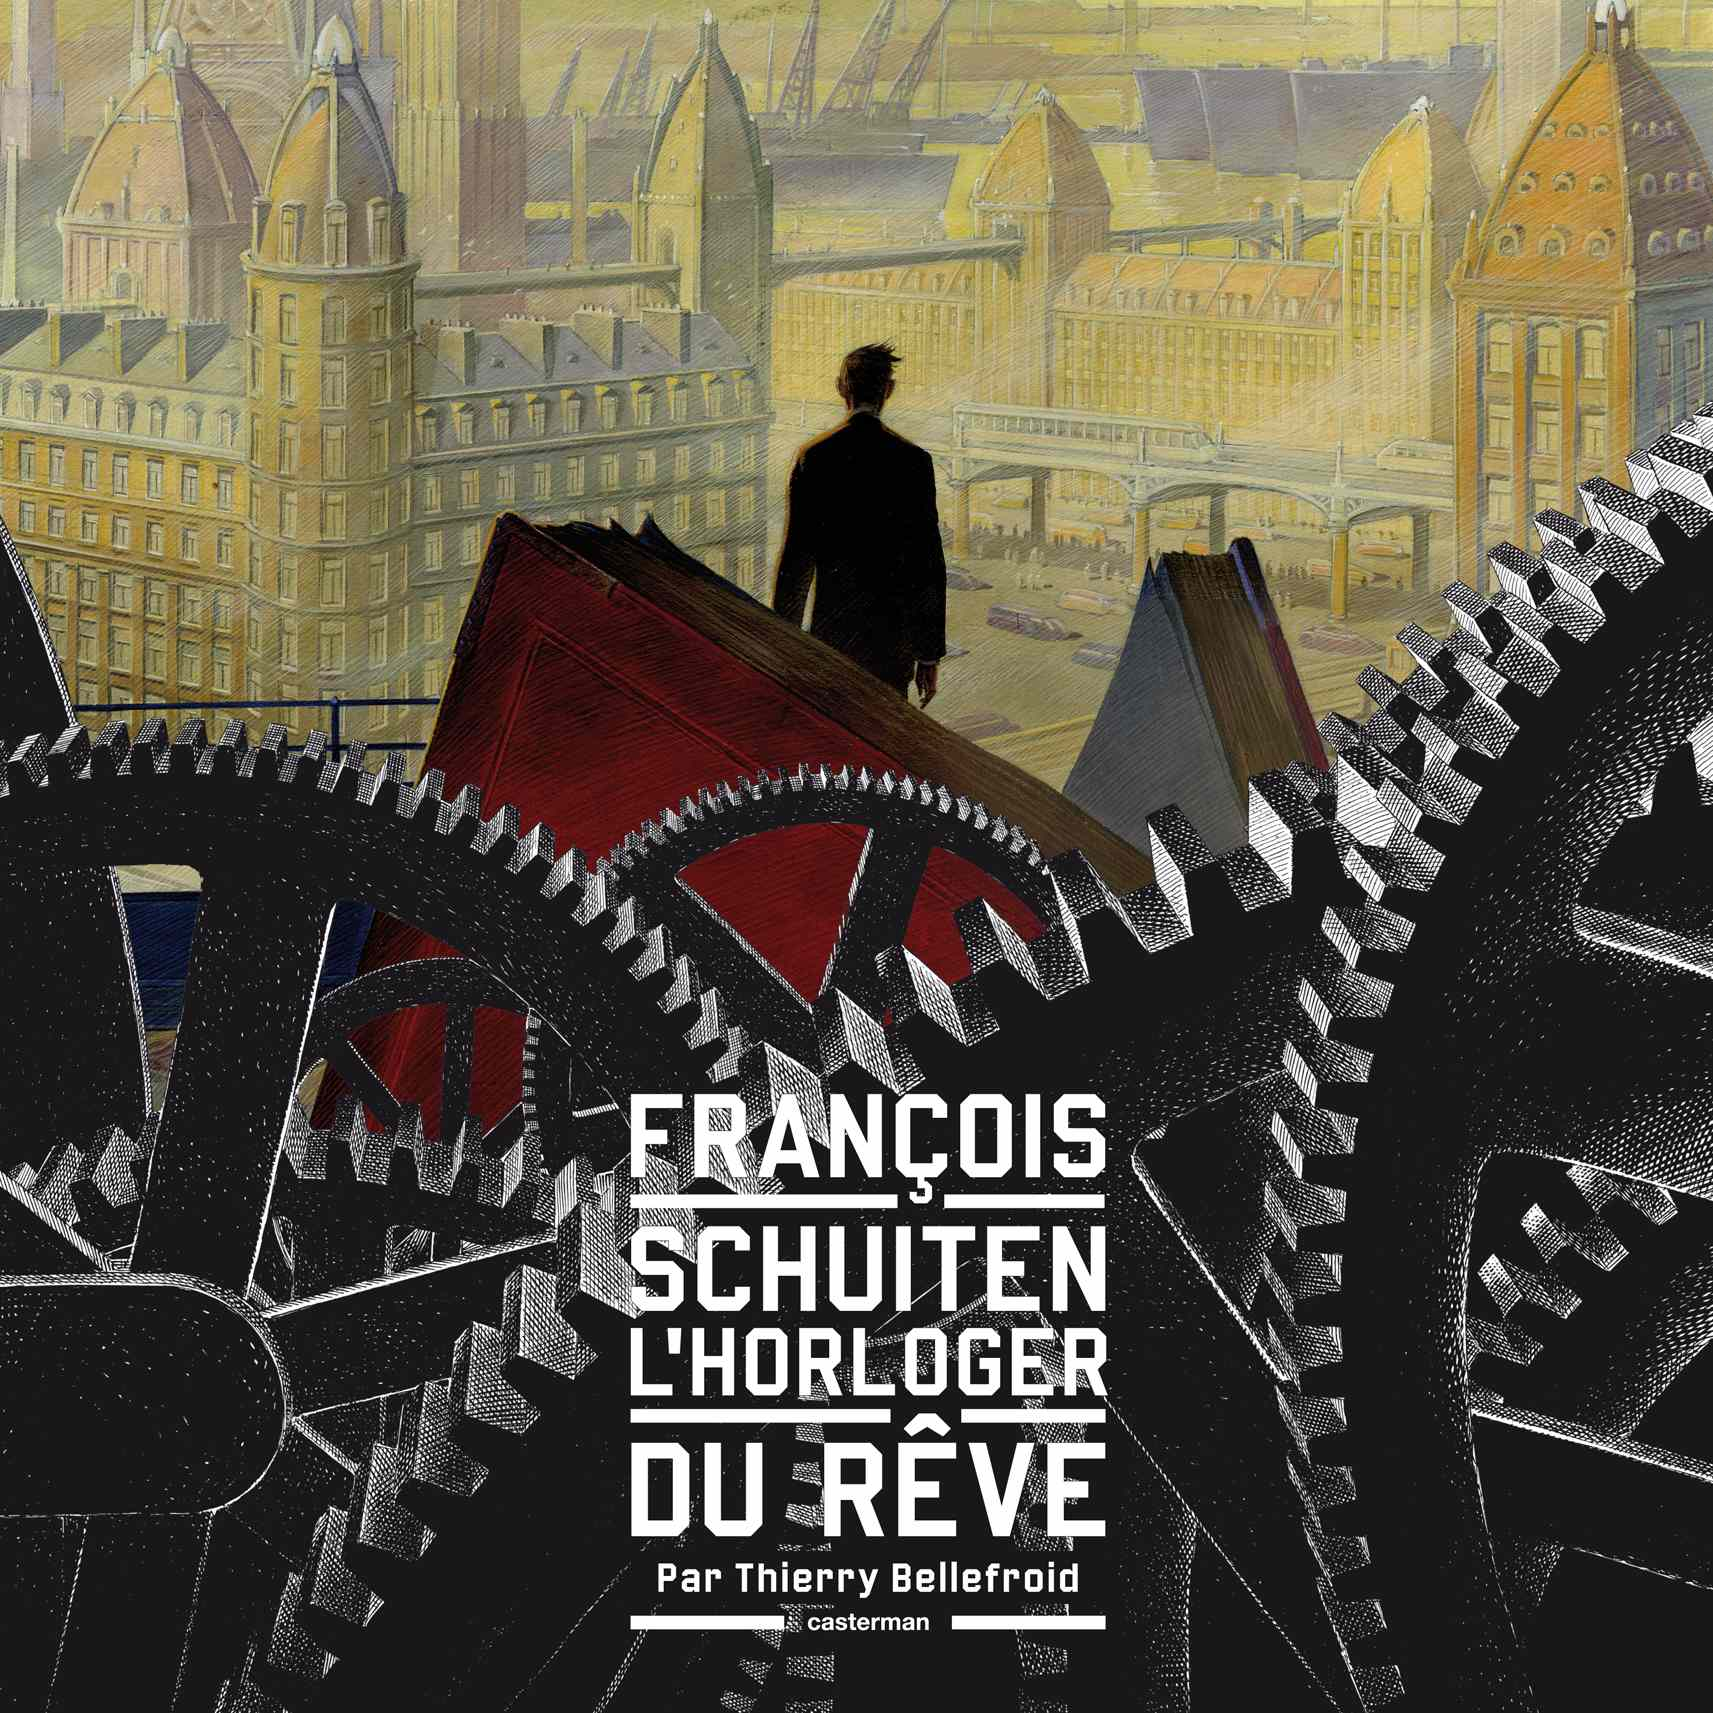 Front cover for **François Schuiten, //l'Horloger du rêve//**